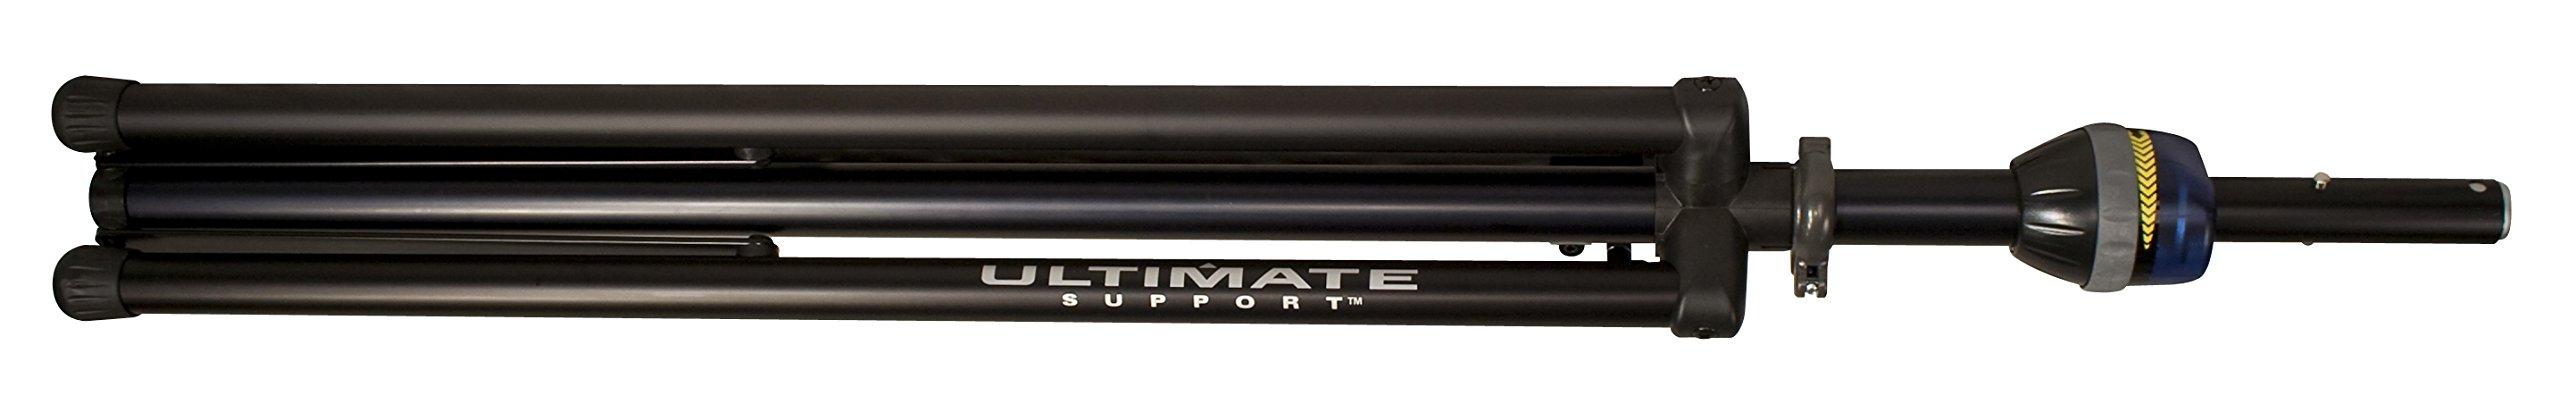 Ultimate Support TS-99BL - TeleLock Series Lift-assist Aluminum Speaker Stand, w/ Speaker Adapter, Xtra Height, Leveling Leg